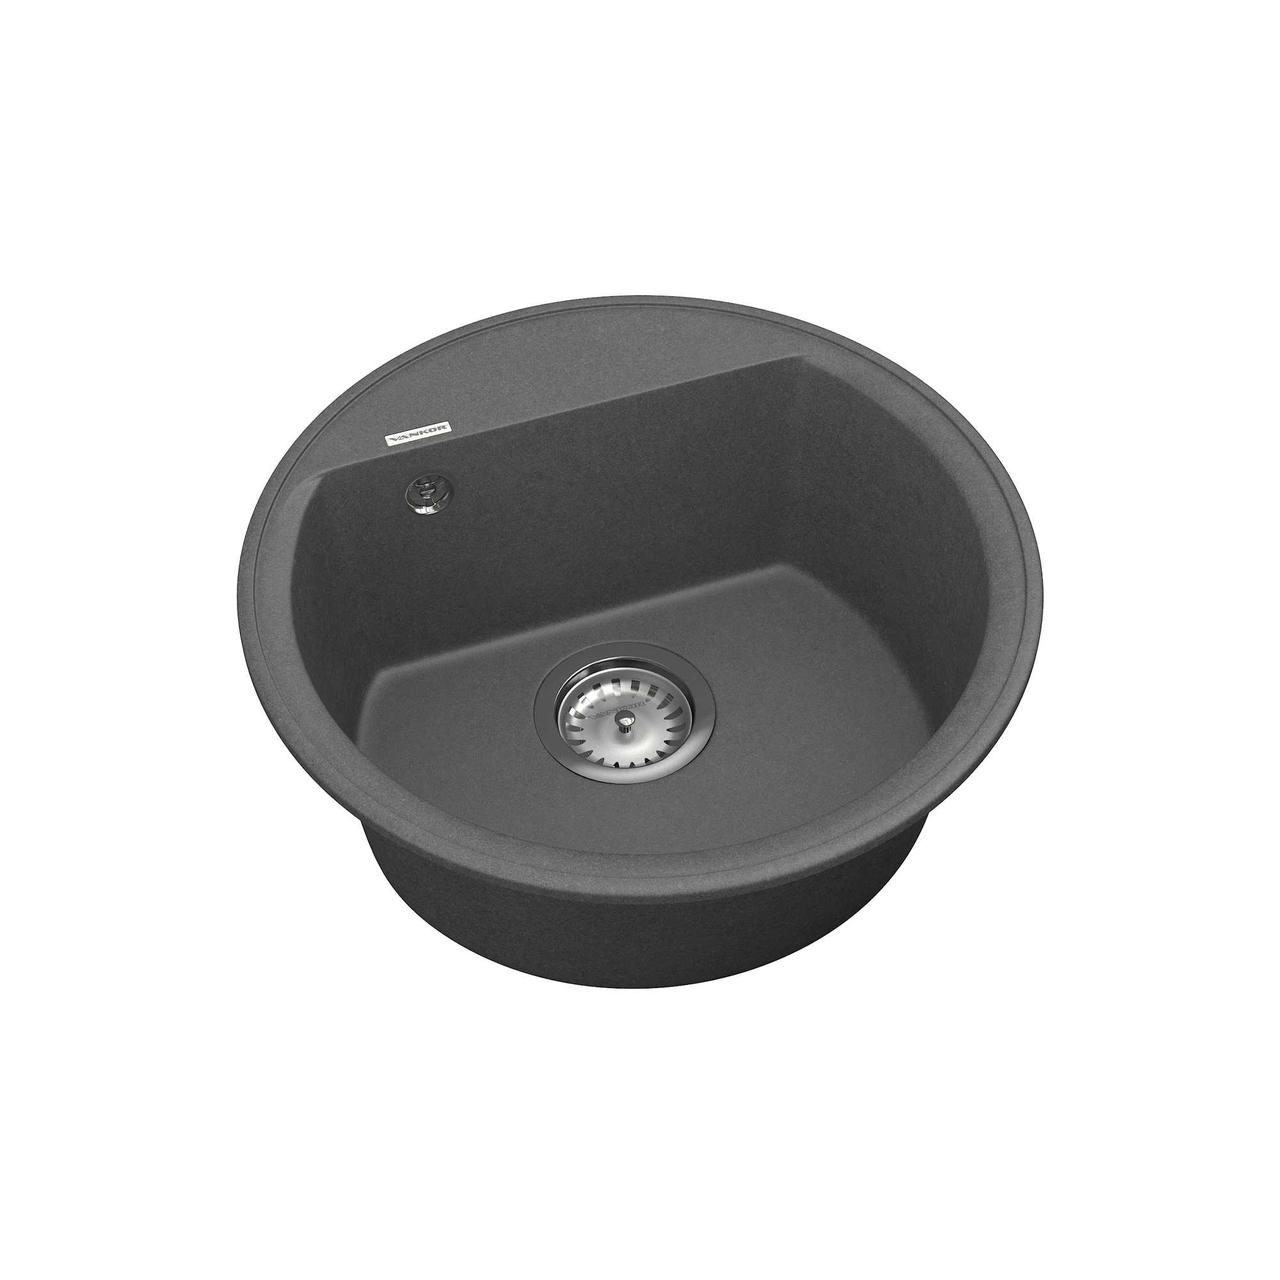 Кухонная мойка Vankor Easy EMR 01.45 Gray+ сифон Vankor